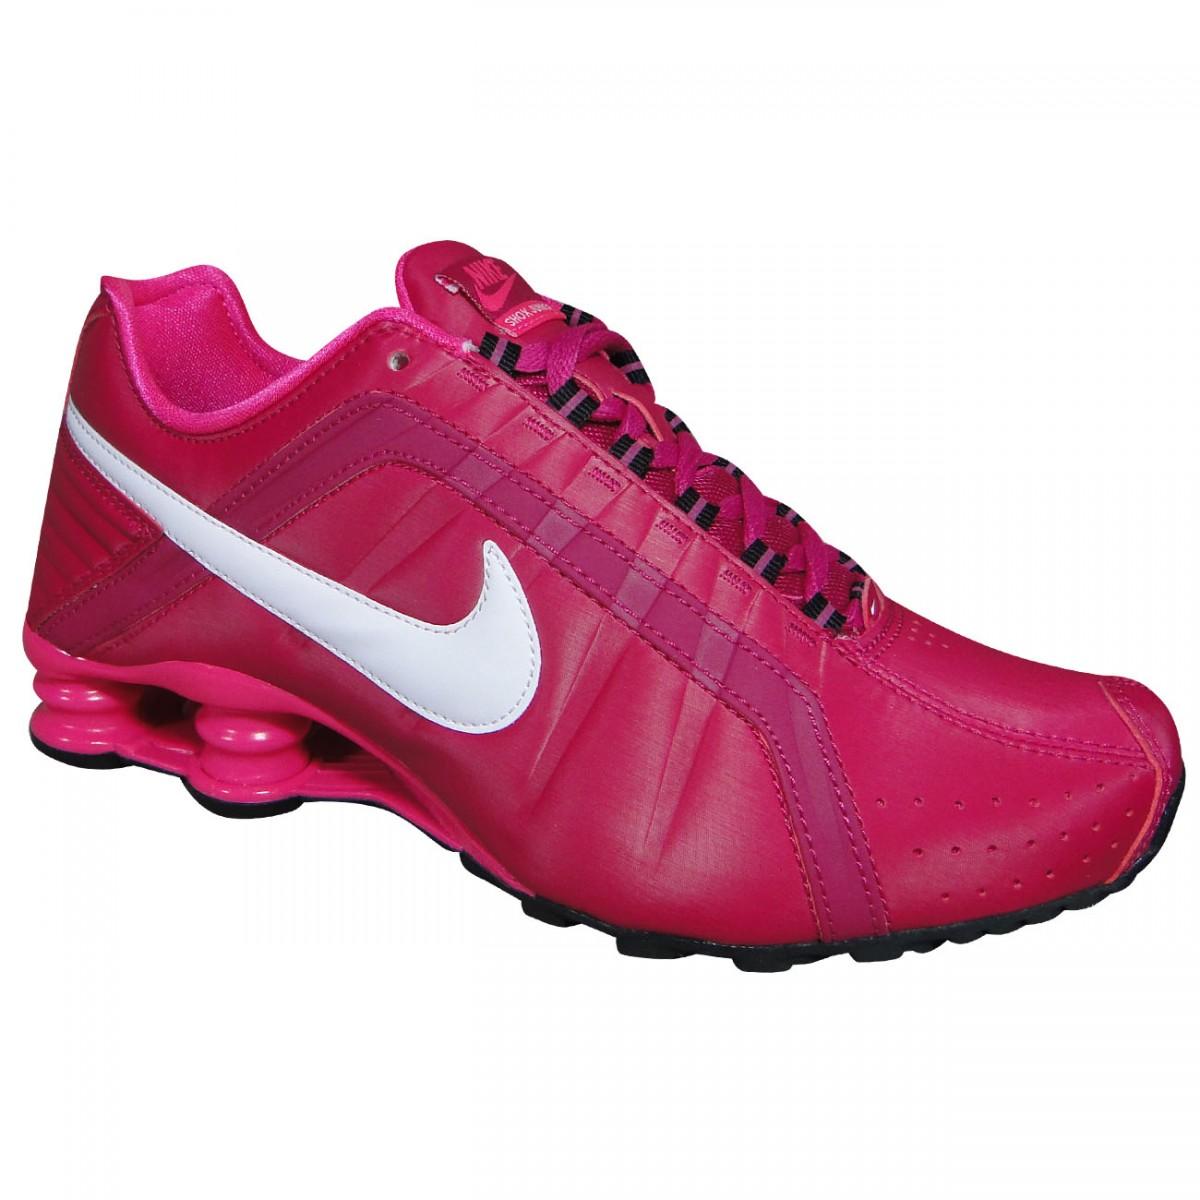 e7422bf7b1 Tênis Nike WMNS Shox Junior Tênis Nike Shox Junior Tenis Nike Shox Junior.